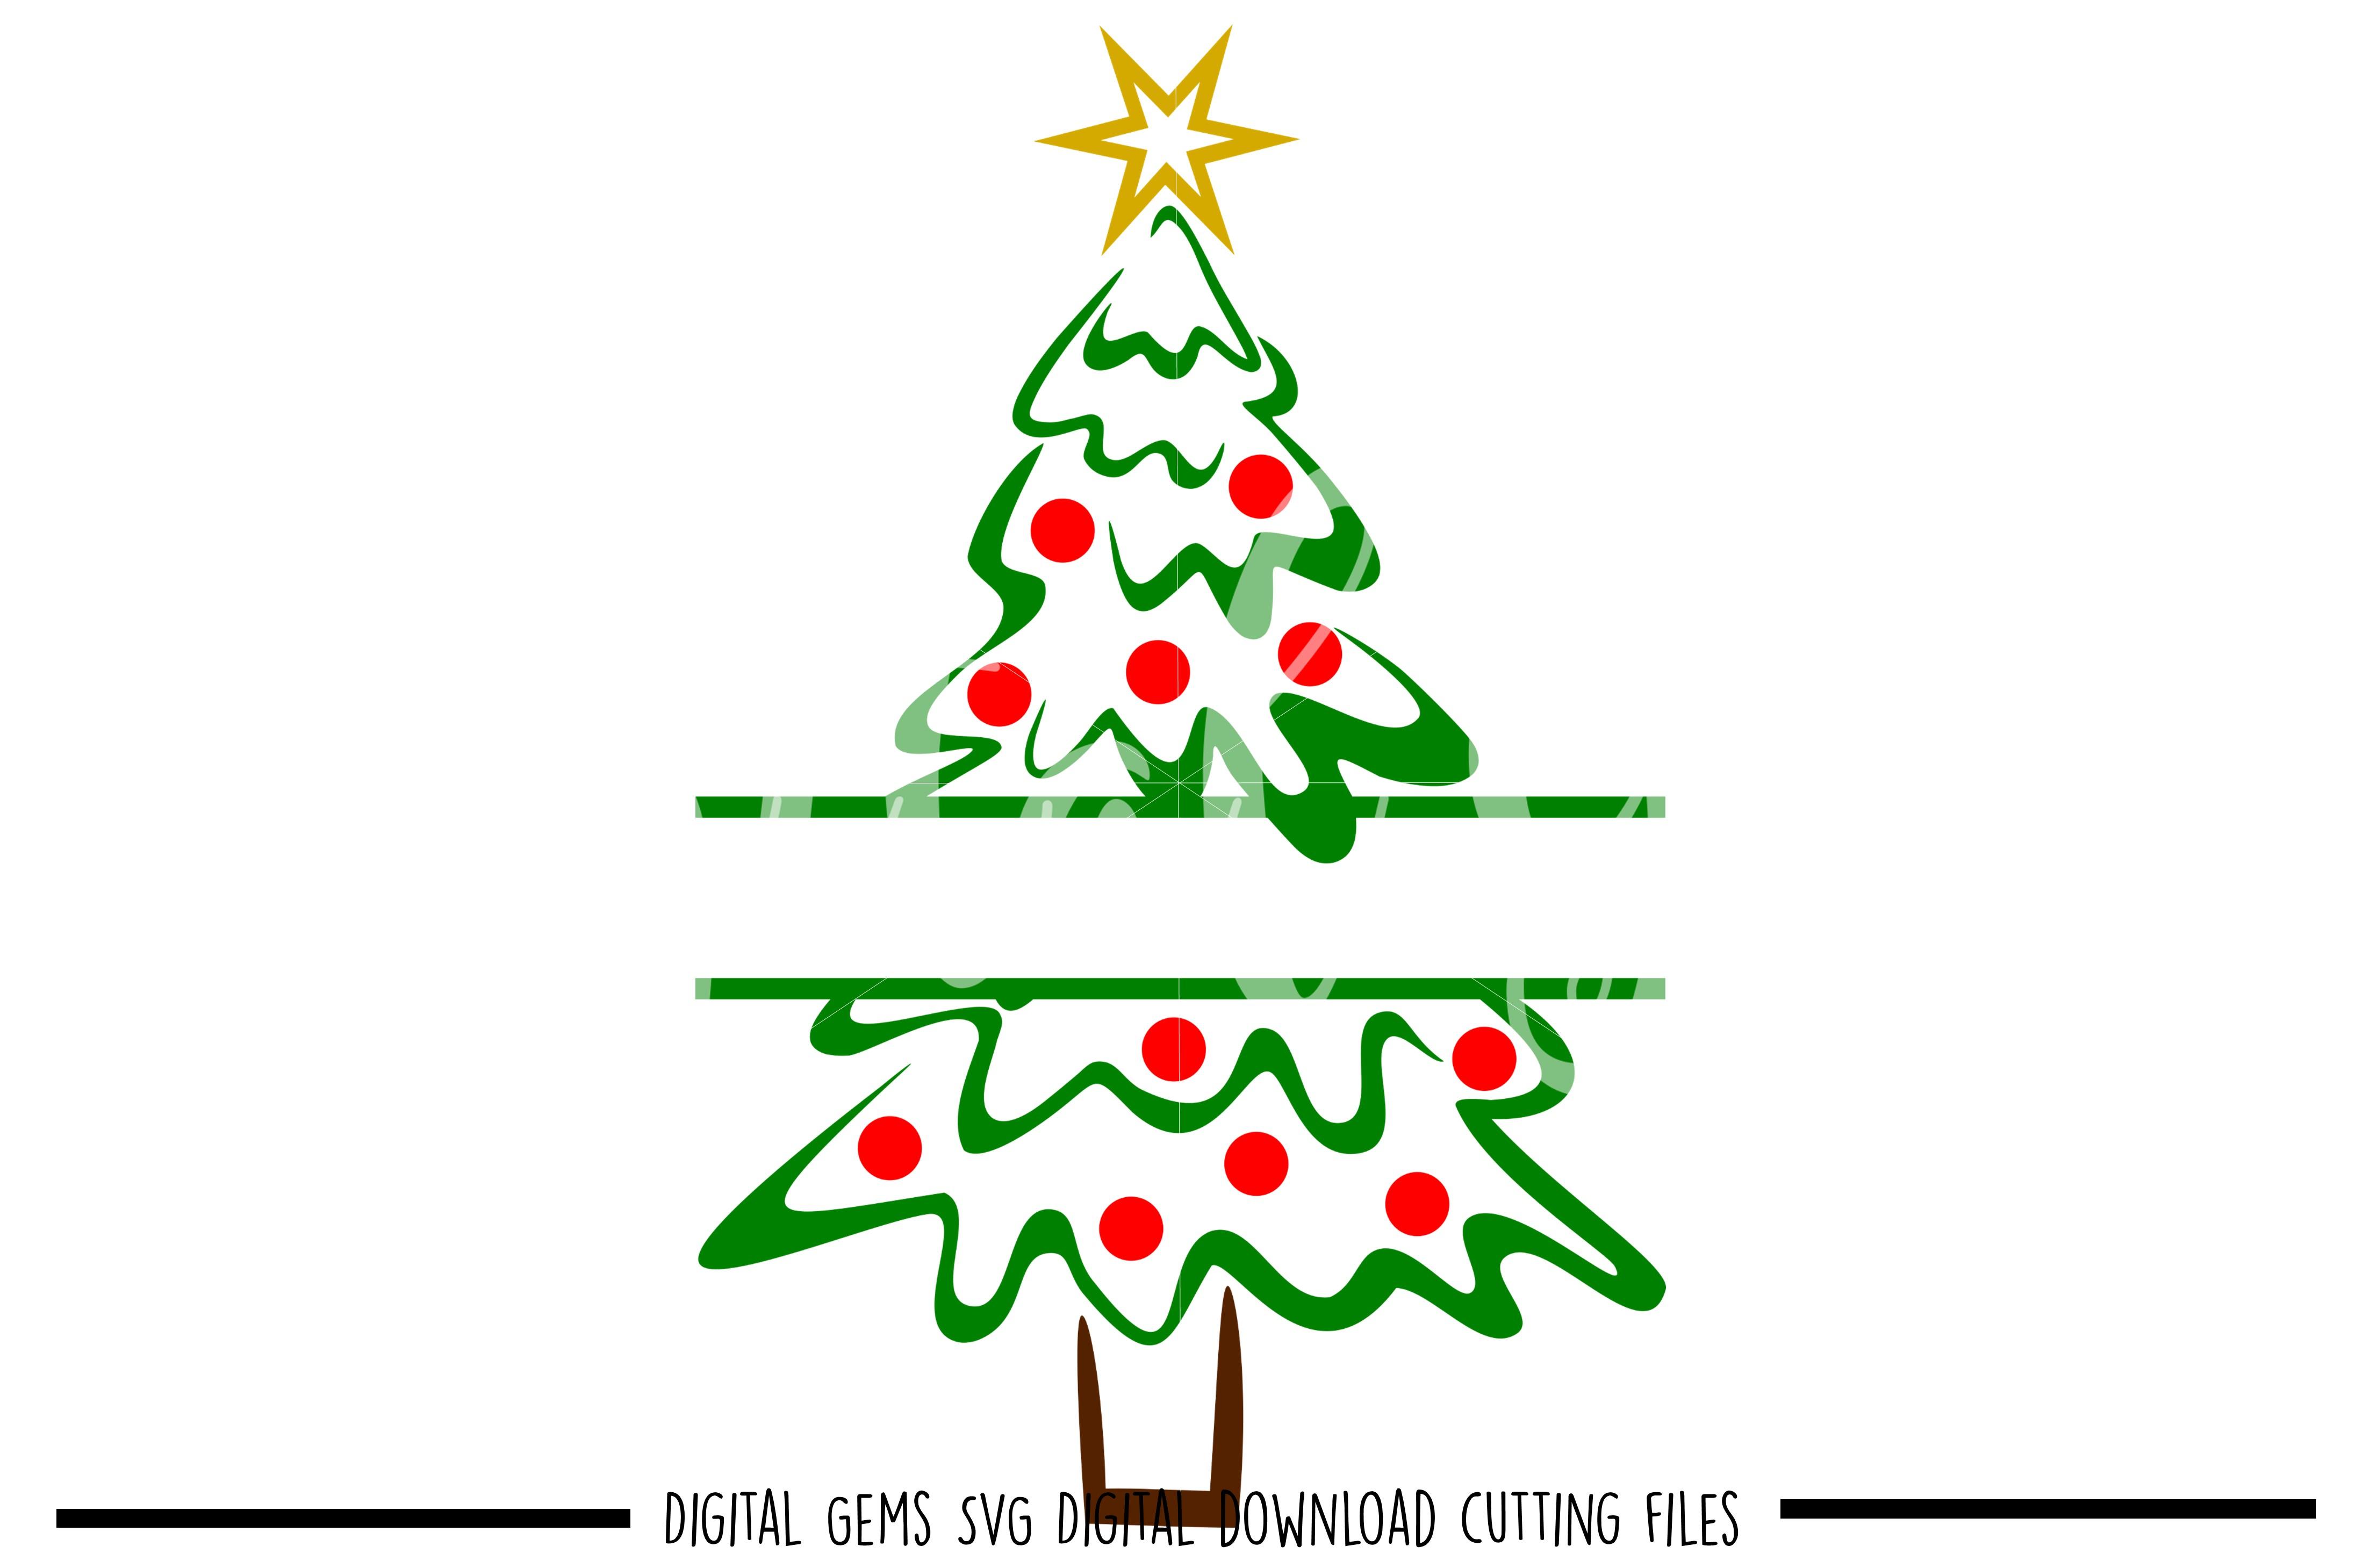 Christmas Tree Svg Png Eps Dxf Files 37497 Svgs Design Bundles